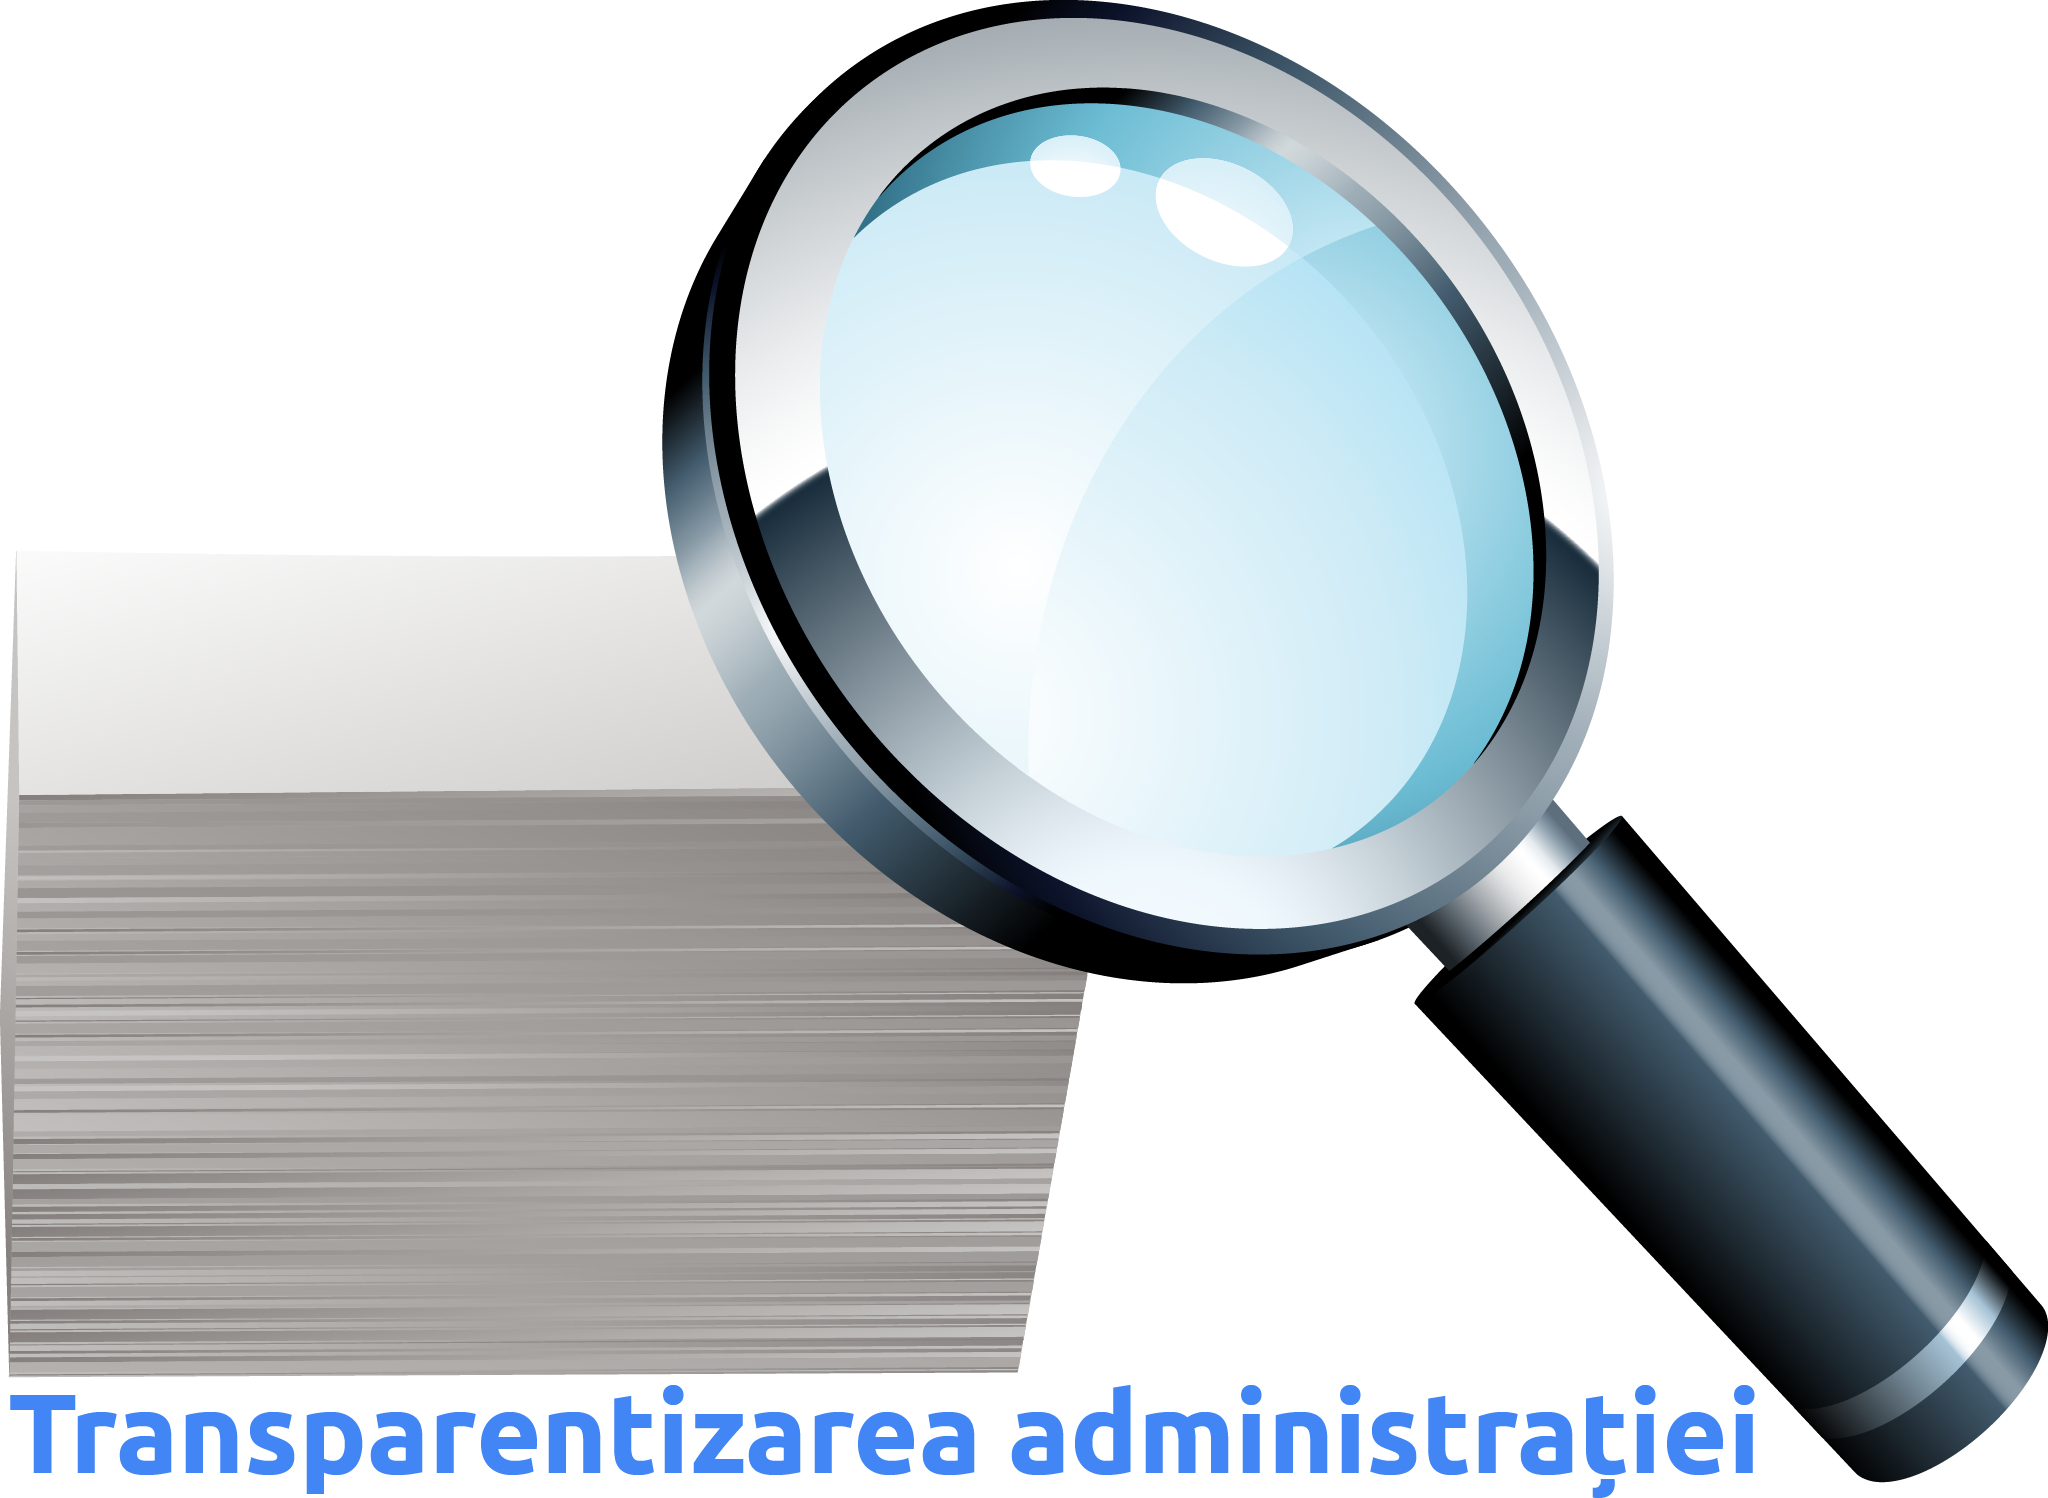 transparentizarea administratiei - proiect Visum